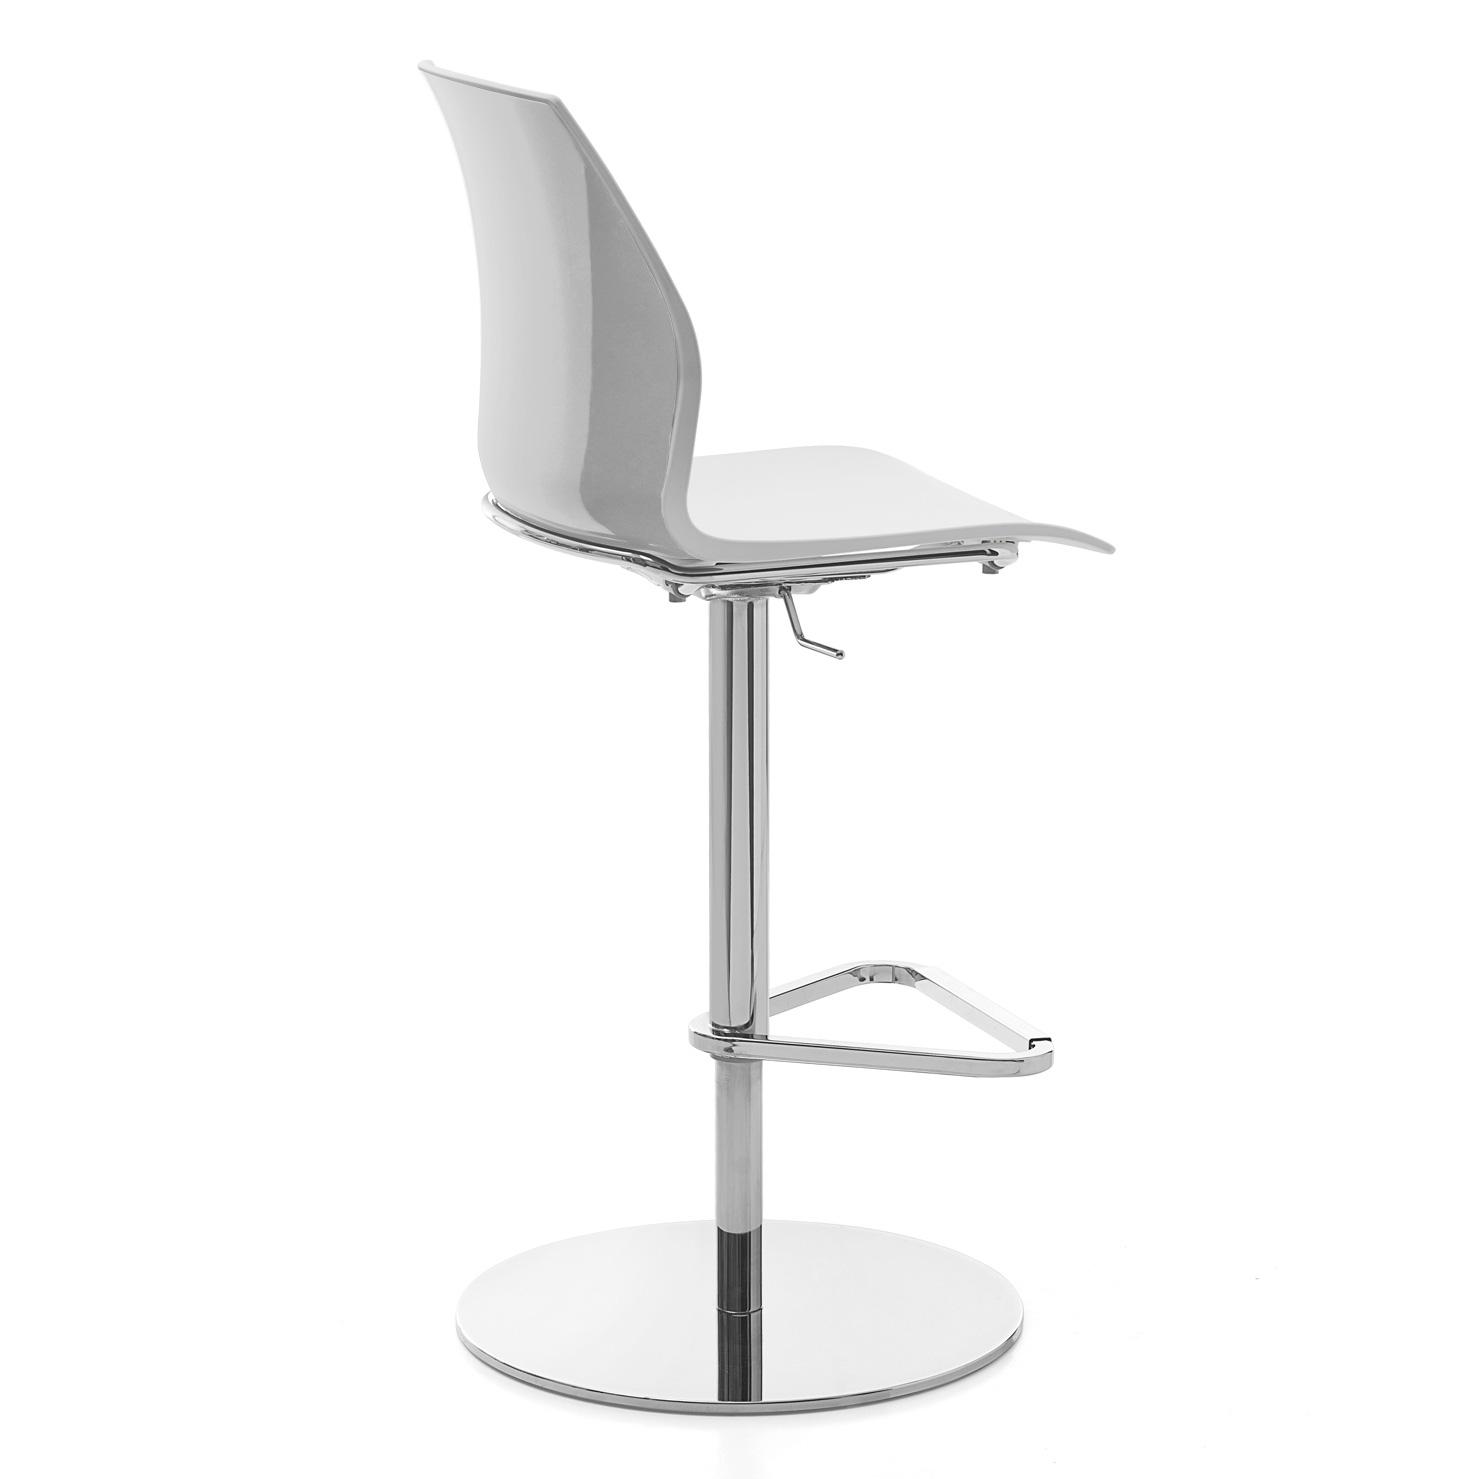 Sensational Kastel Kalea Height Adjustable Bar Stool Flat Base 58 80 Cm Evergreenethics Interior Chair Design Evergreenethicsorg